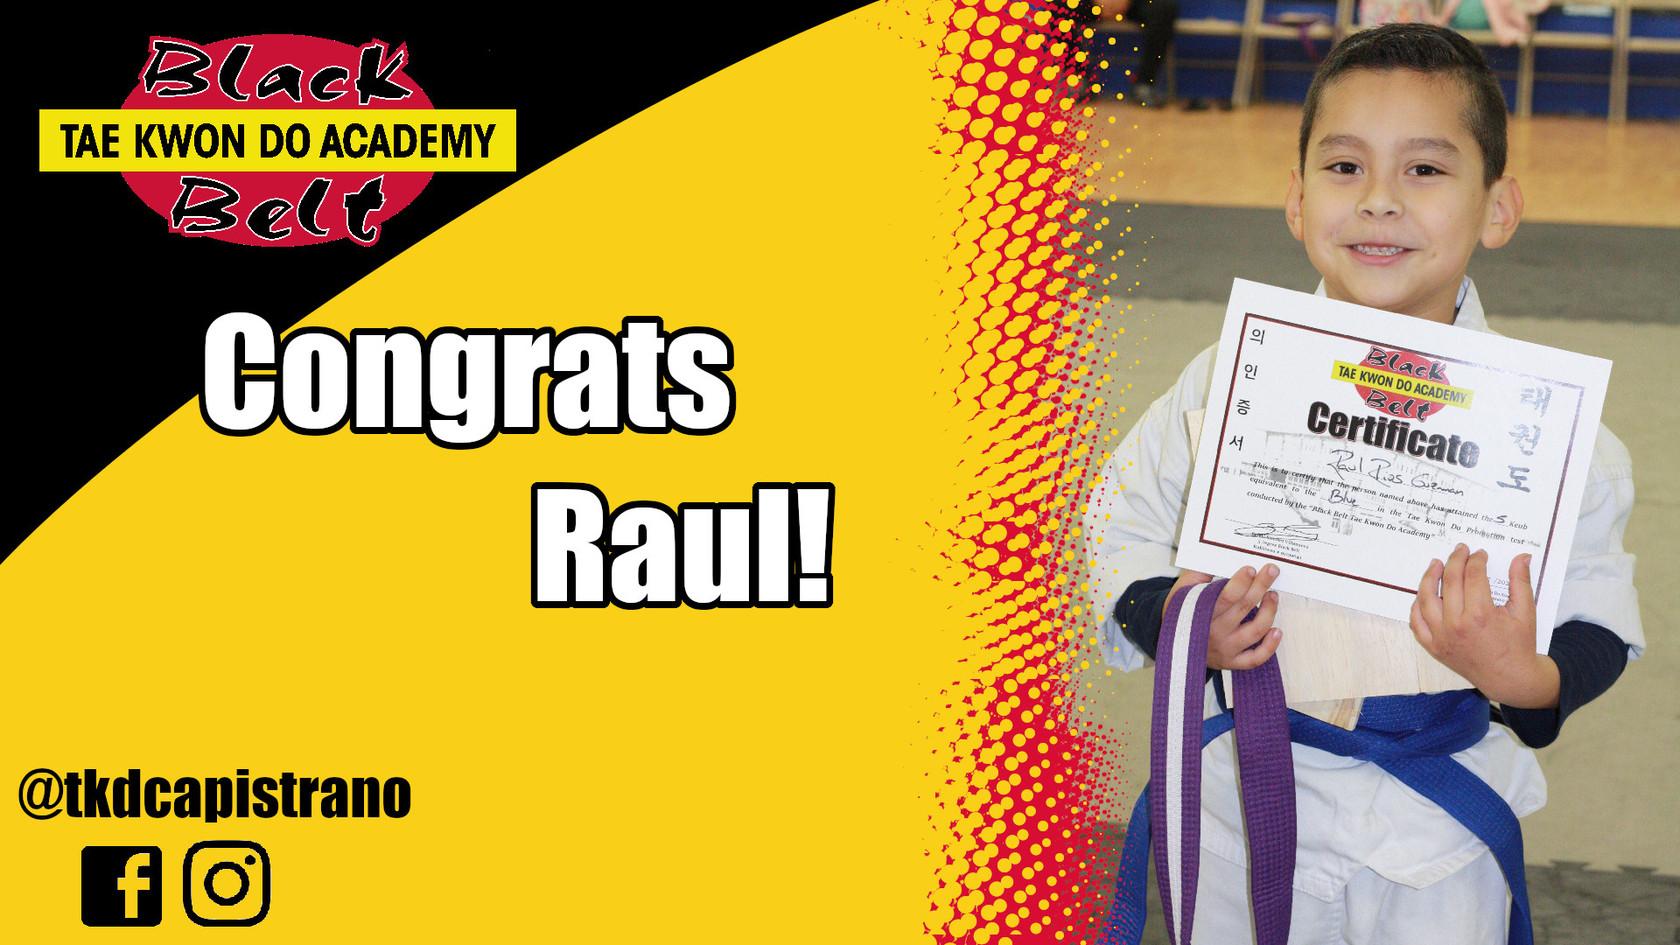 Congrats Raul!